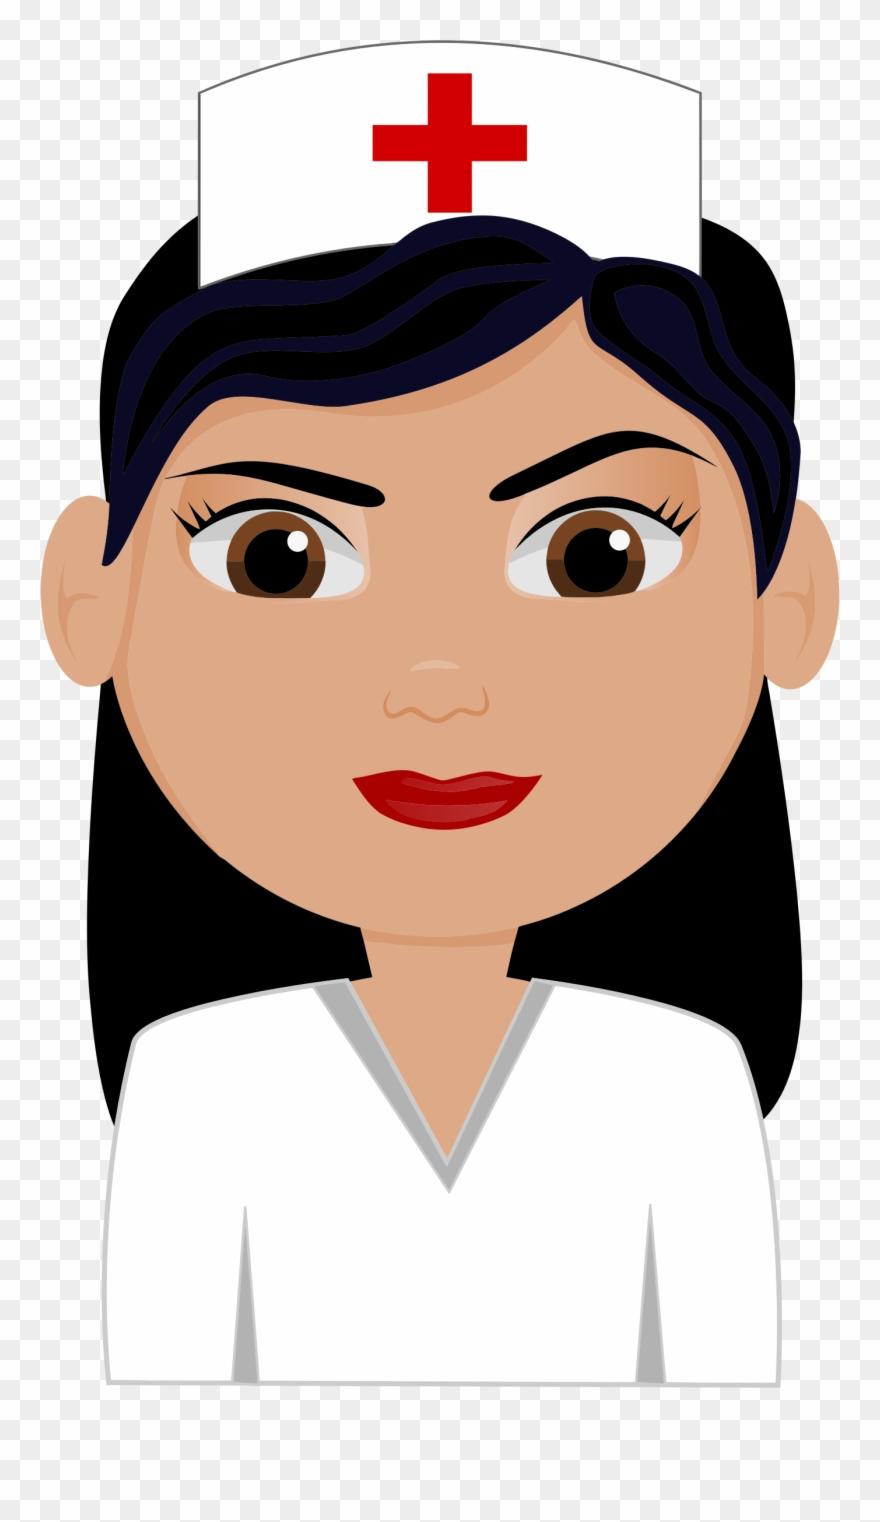 Nursing clipart face. Free cute nurse picture